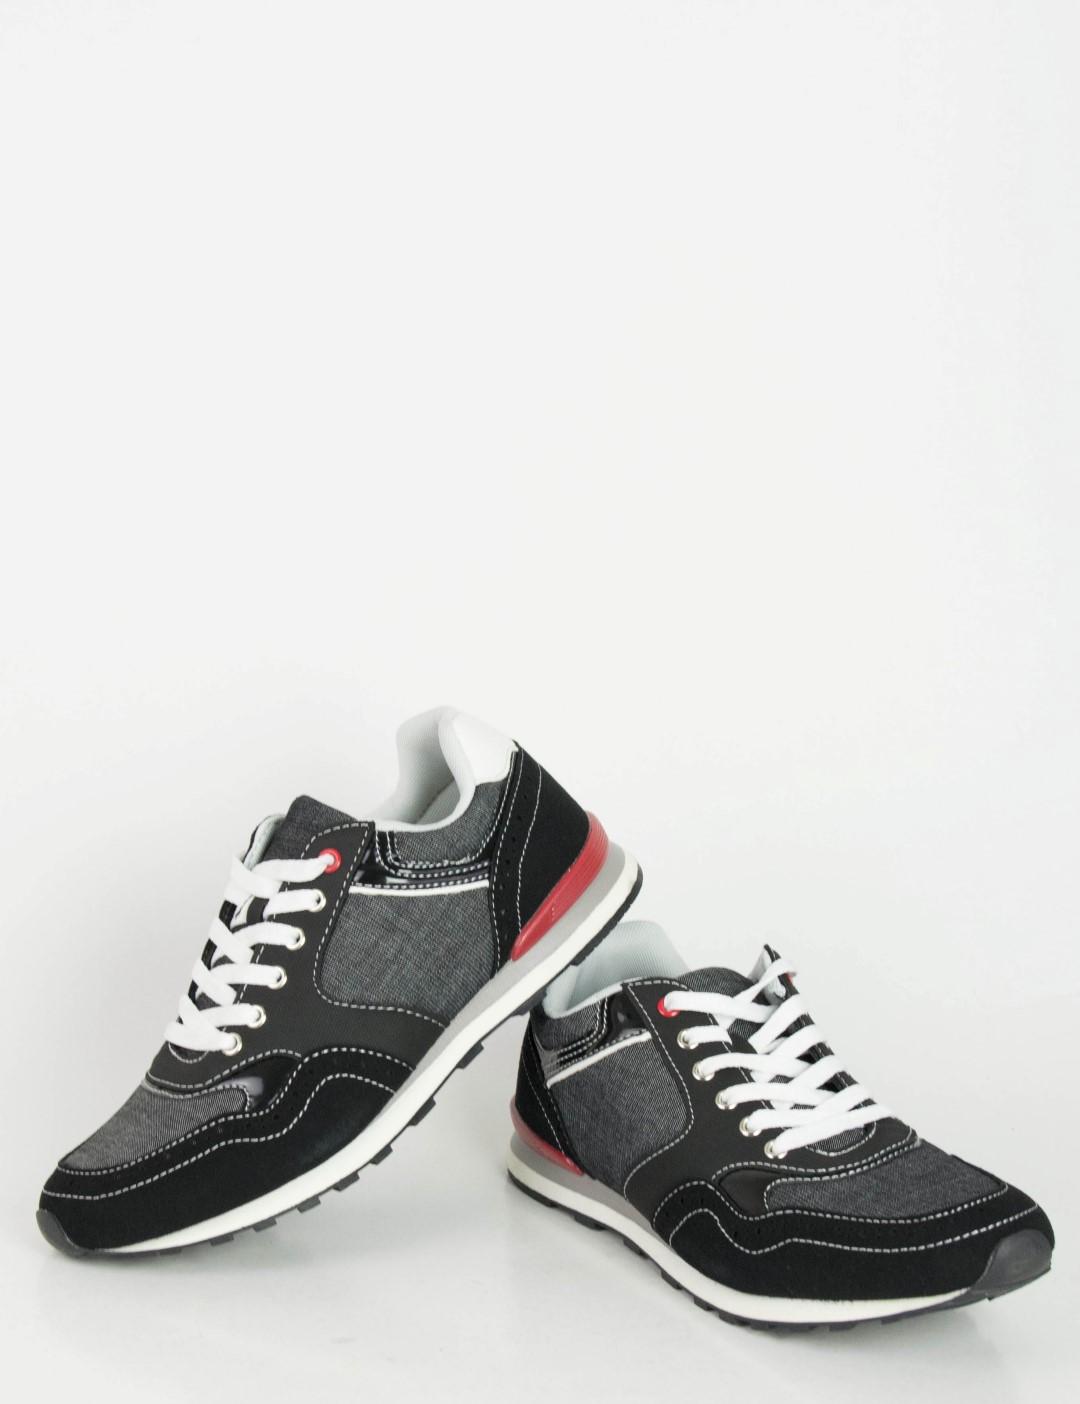 2874374d95f Ανδρικά μαύρα Sneakers παπούτσια με κορδόνια R8276